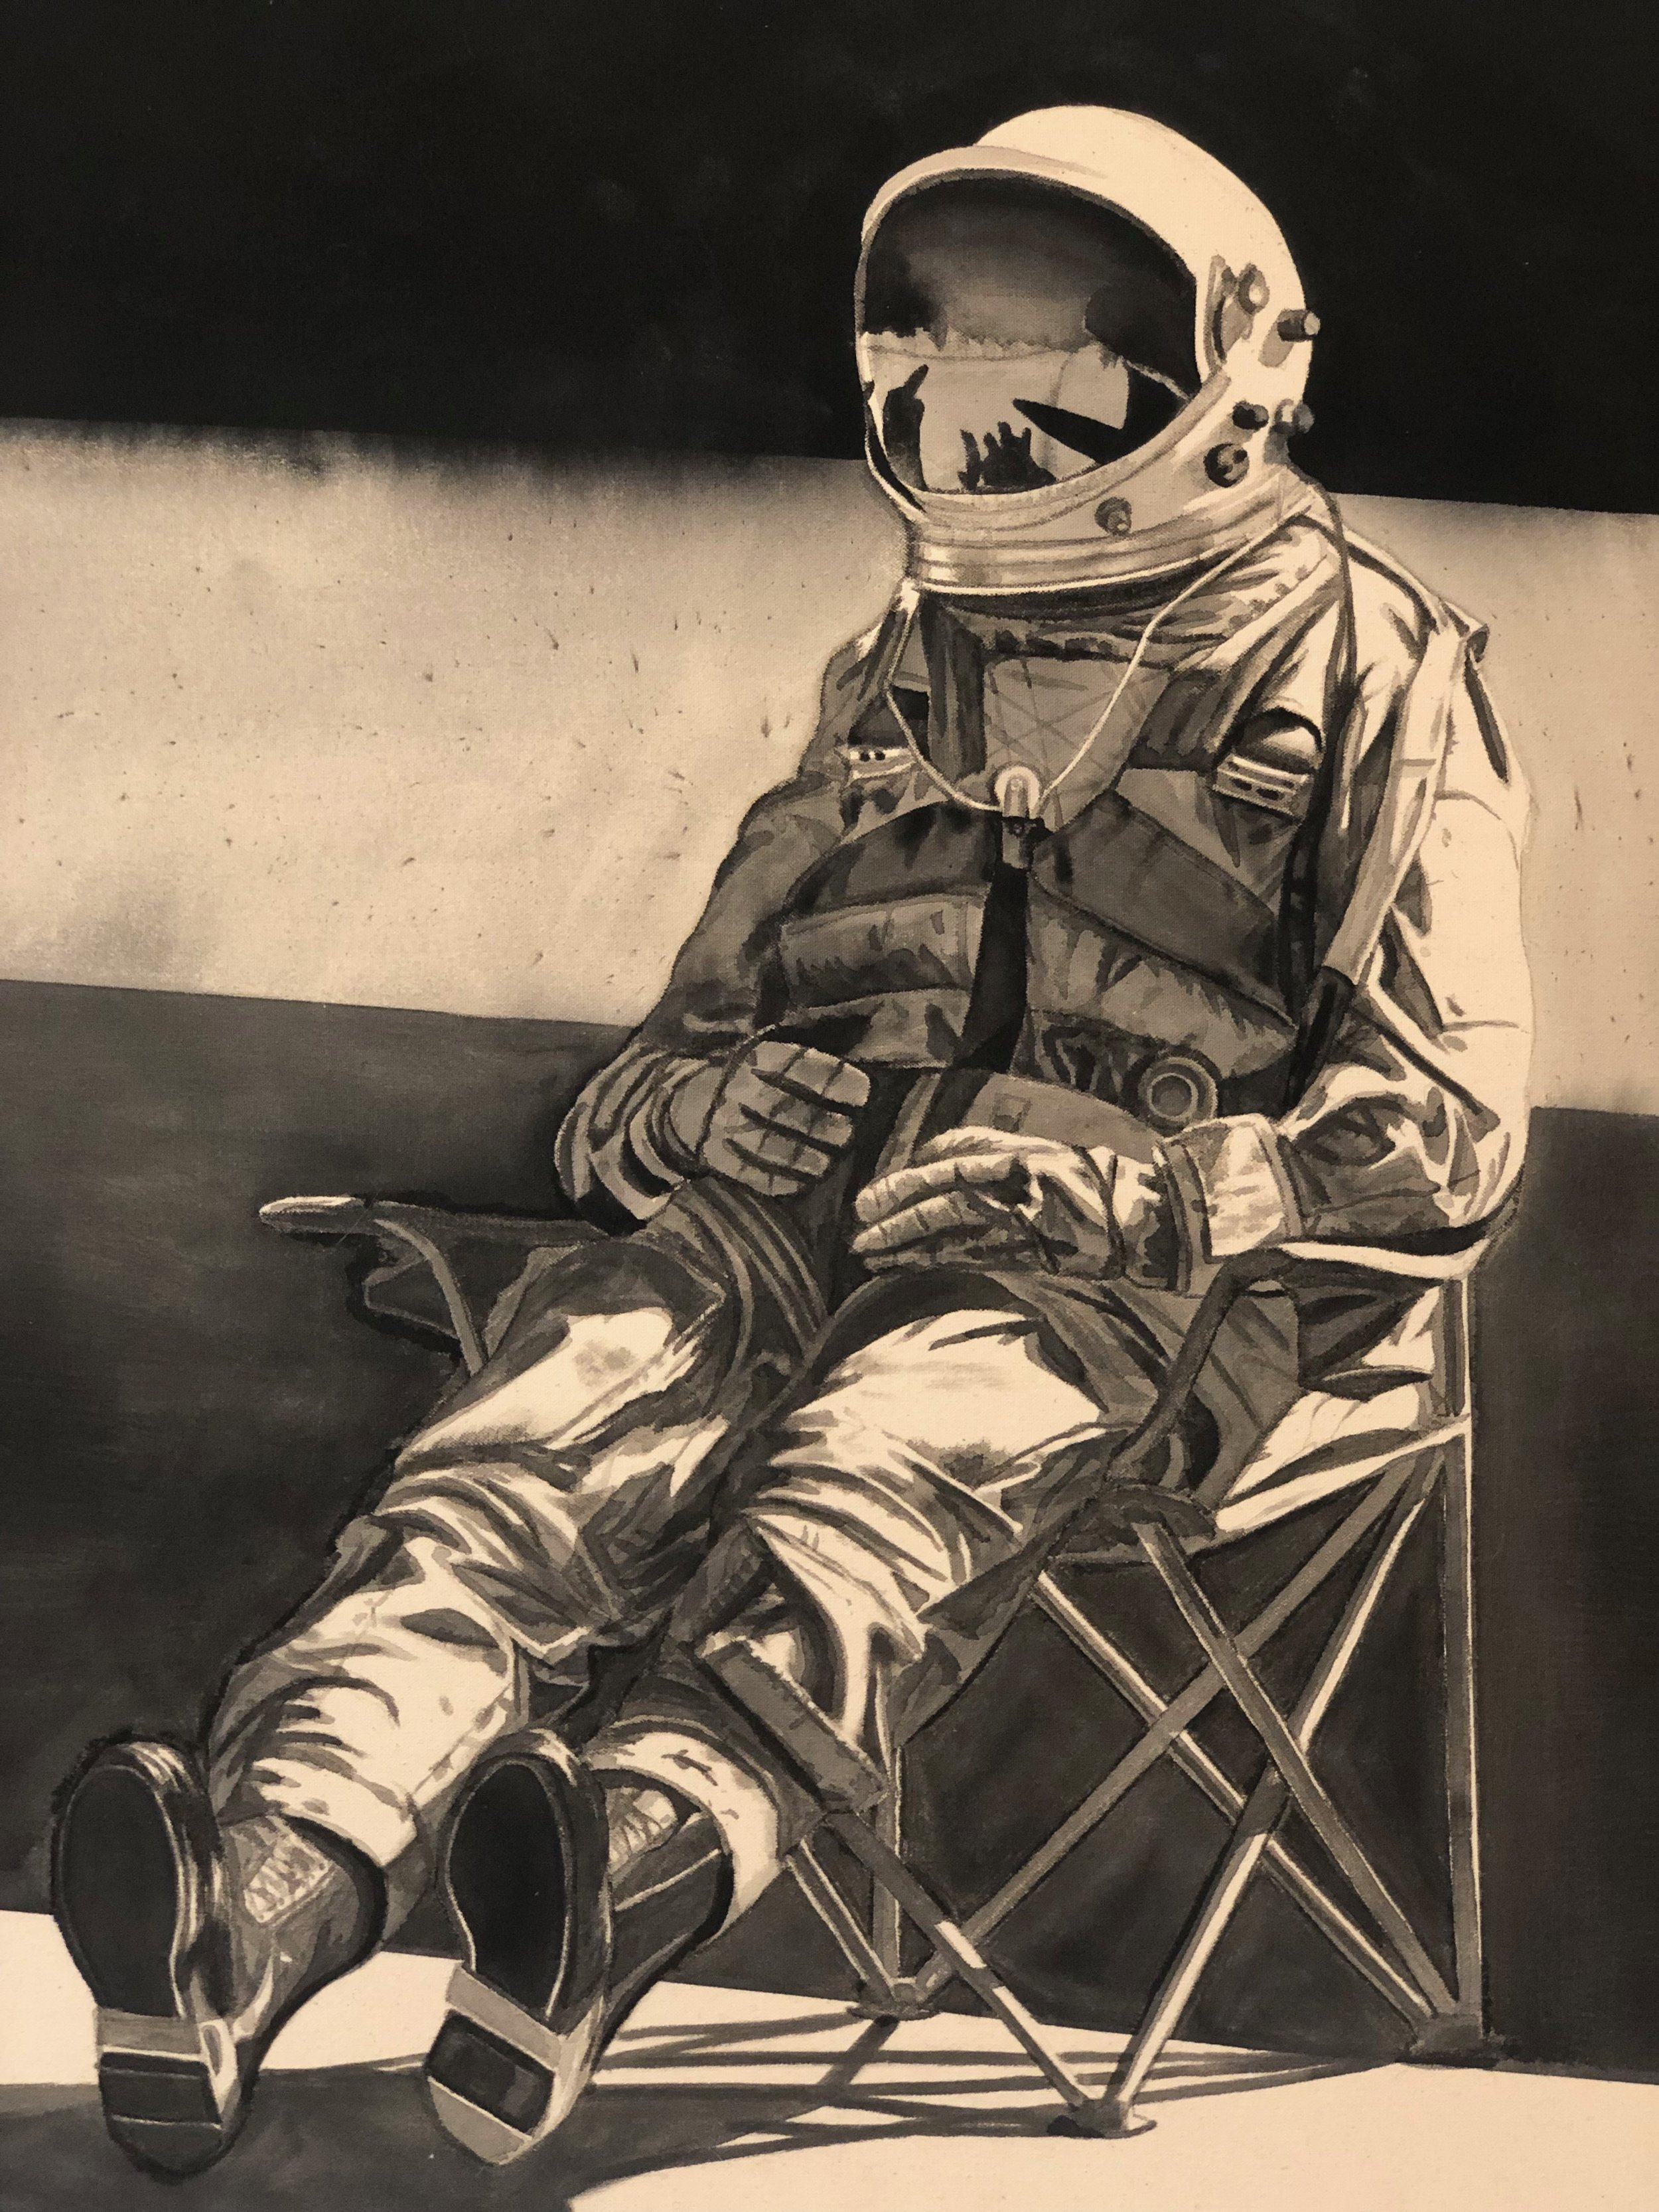 The Astronaut  [detail], 2019 Black gesso on canvas 36 x 48 inches (91.4cm x 122cm)